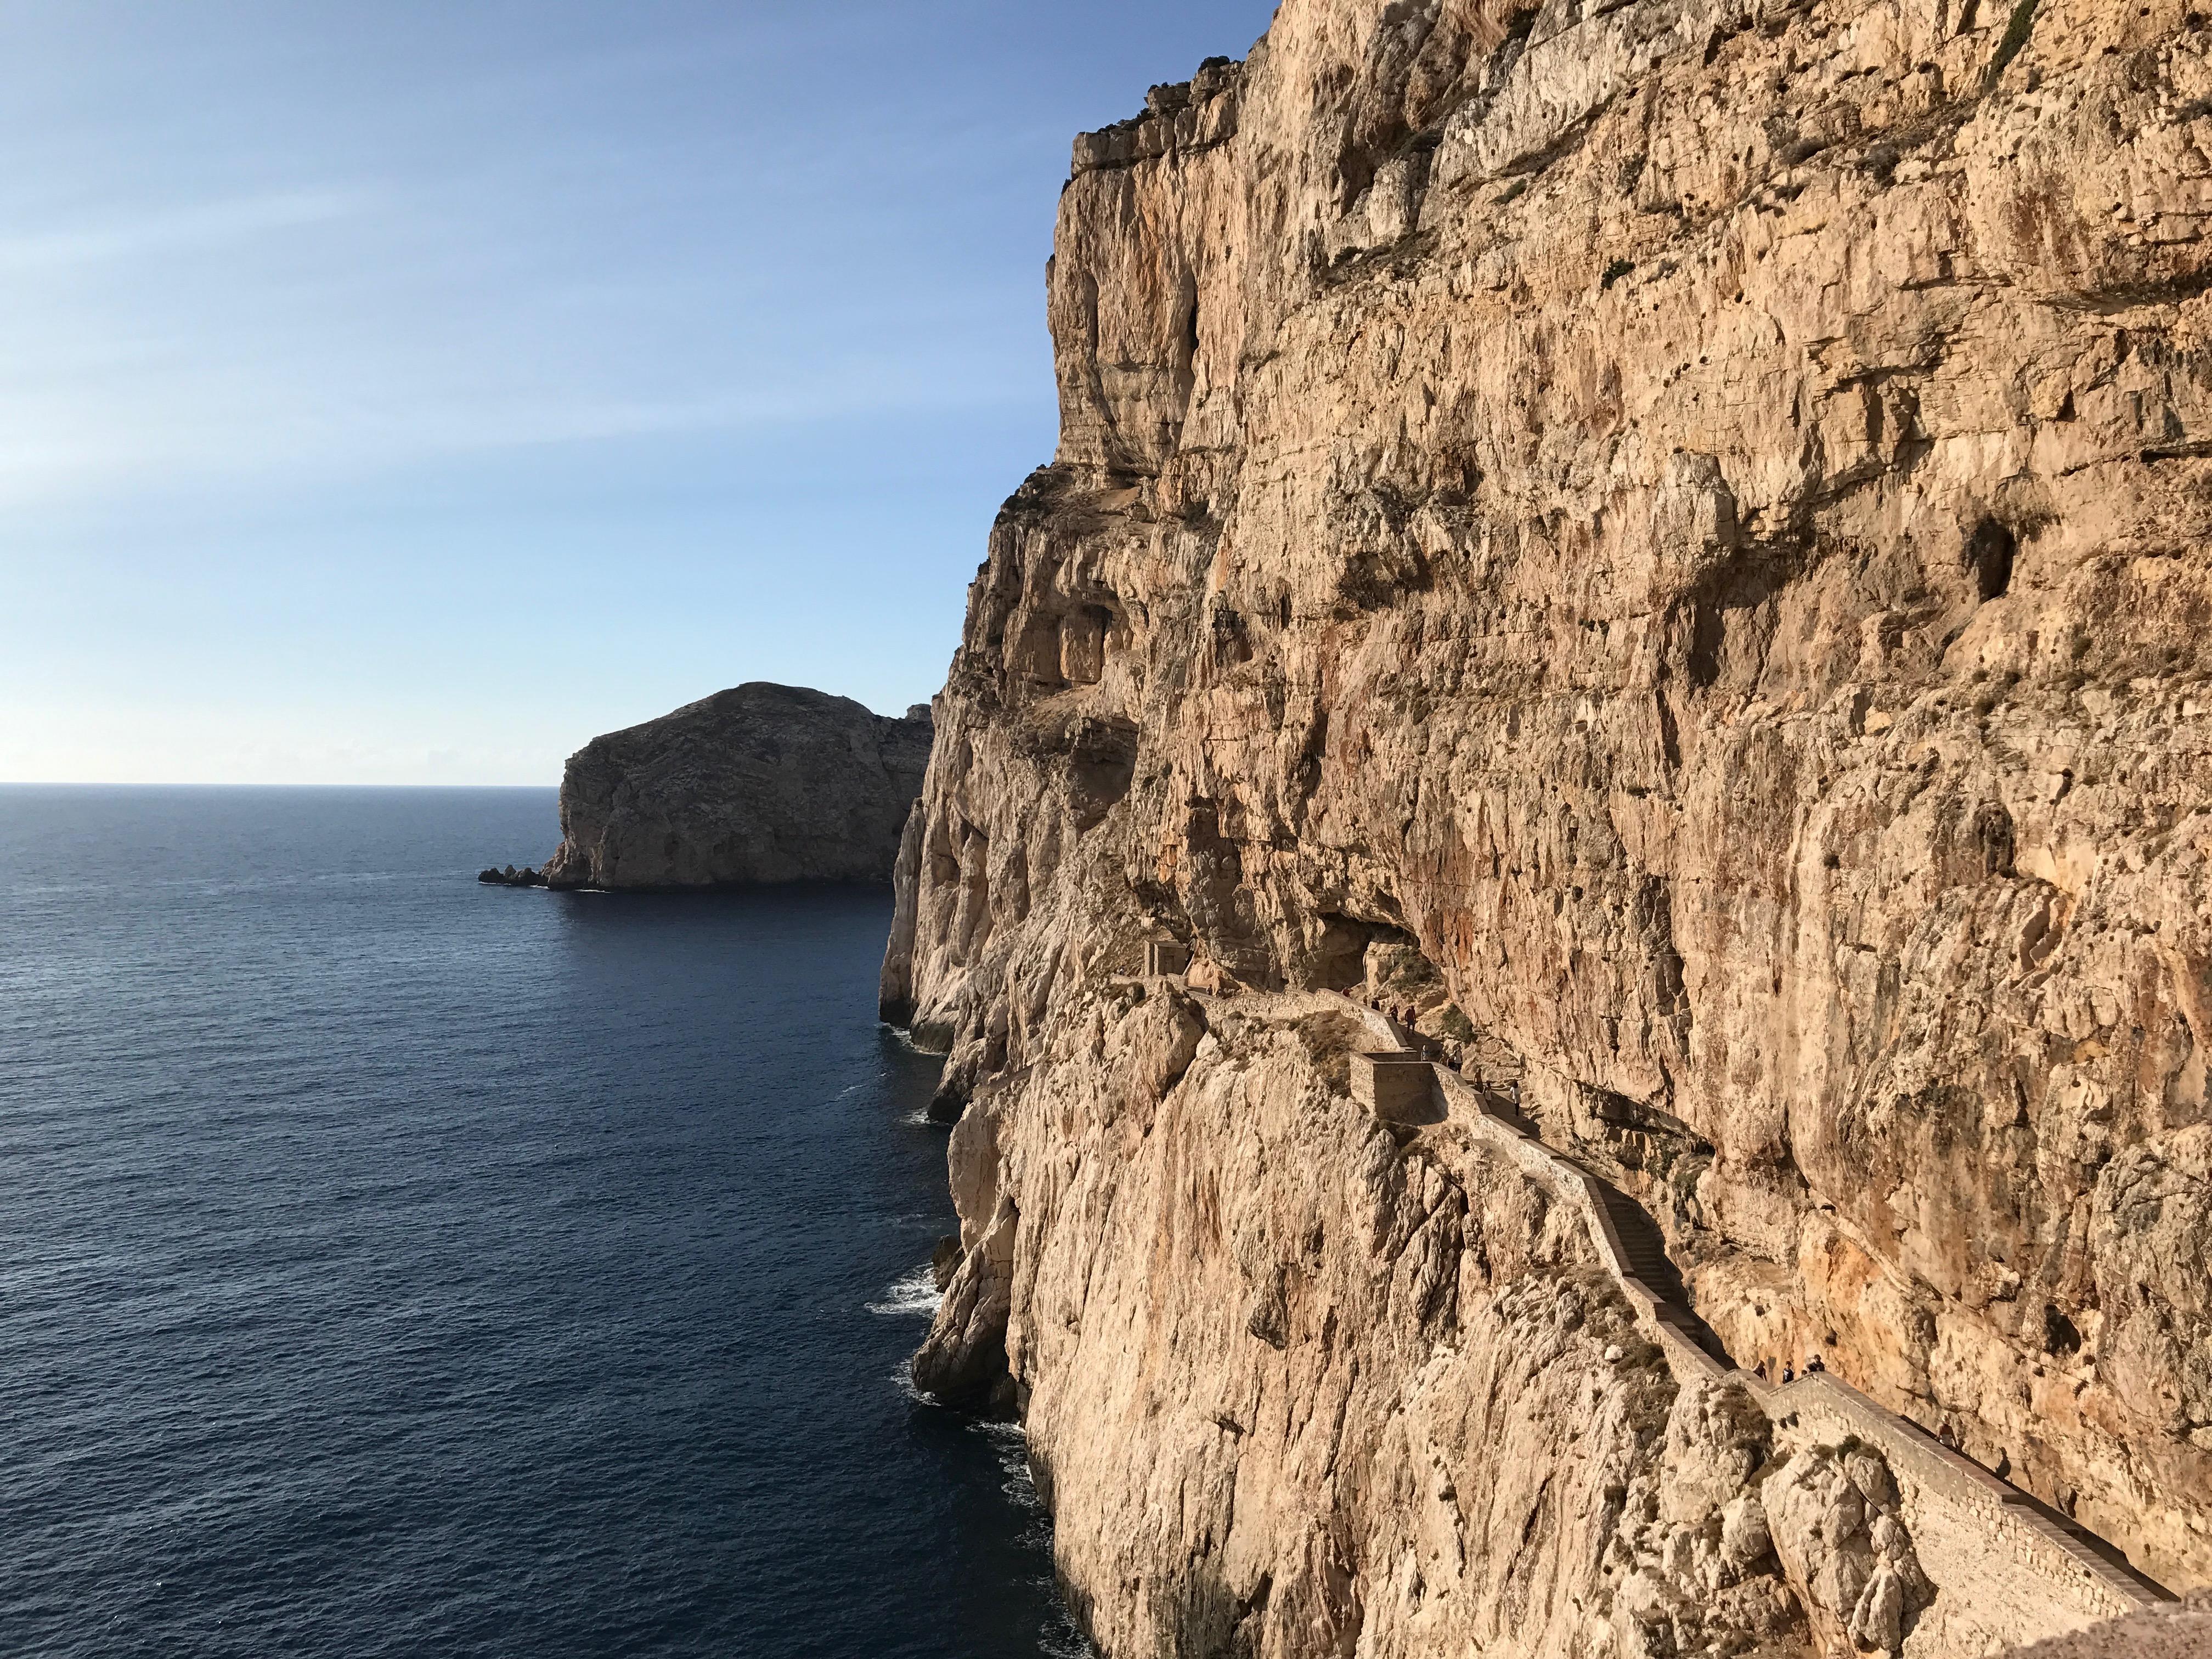 Priya the Blog, Nashville travel blogger, Italian vacation, Sardinia vacation, Italy trip, #basicbellas, Capo Caccia National Park, Neptune's Grotto, Capo Caccia cliffs Sardinia, de Grotta de Nettuno